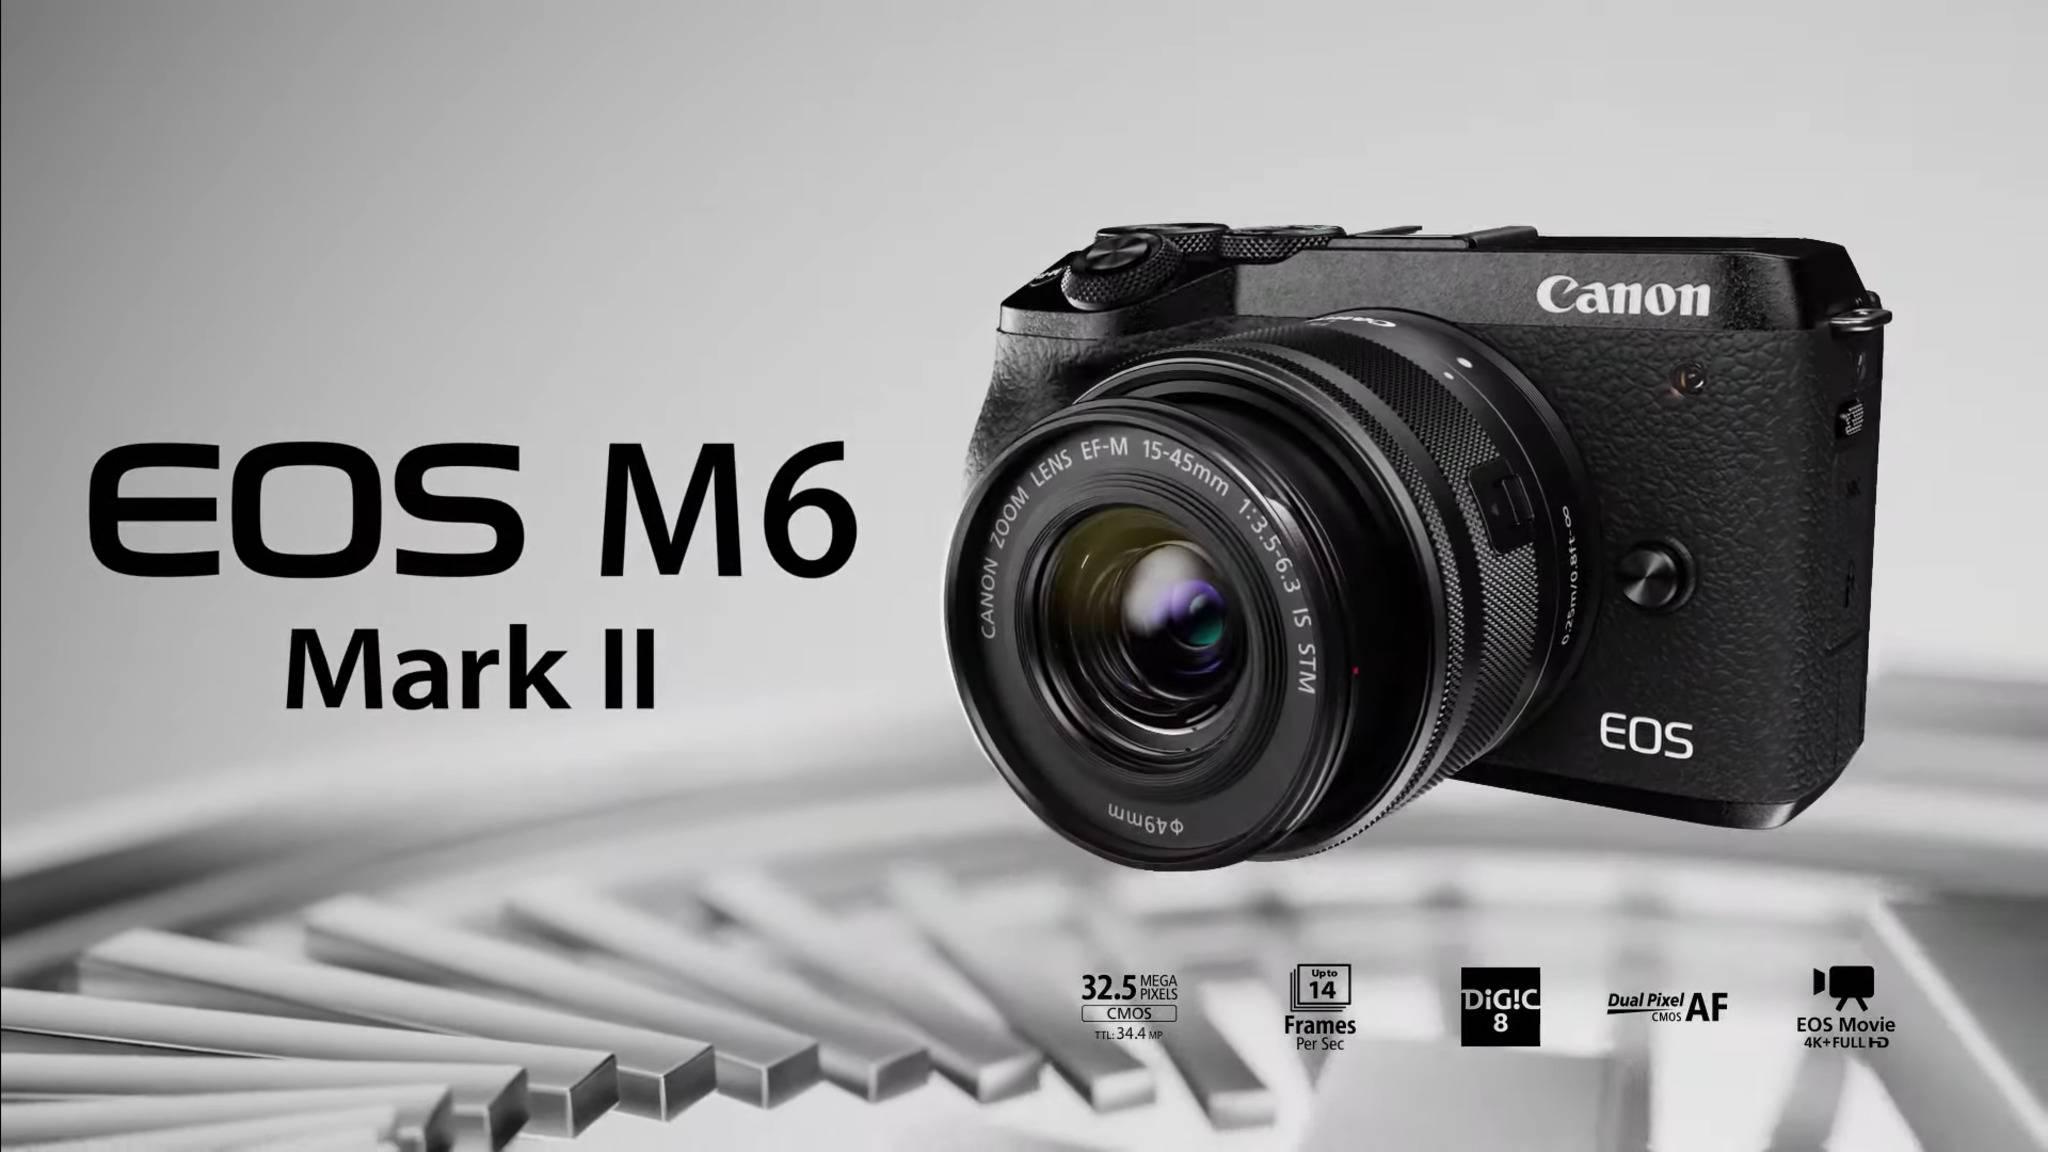 canon-eos-m6-mark-2-dslm